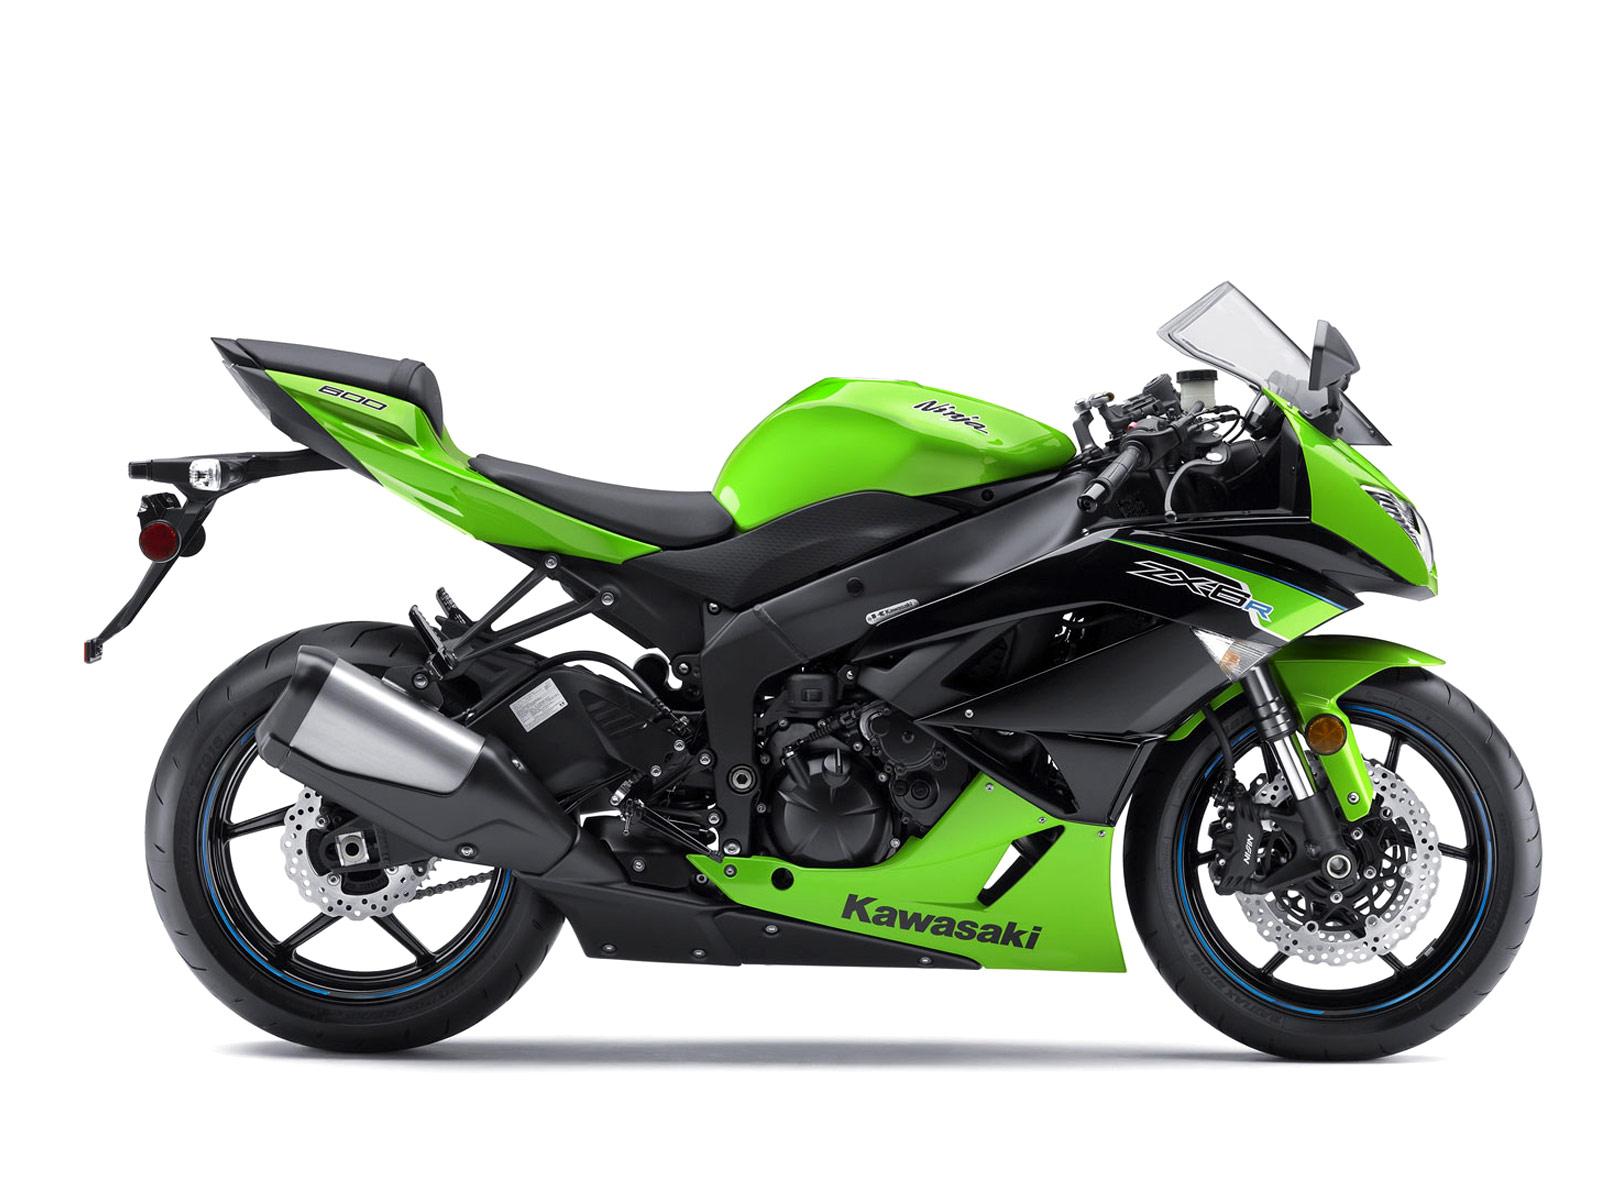 http://3.bp.blogspot.com/-4V7KZTEfxrk/TvMql7lSTPI/AAAAAAAAFx8/Ij01y4jILLA/s1600/2012-Kawasaki-Ninja-ZX-6R_motorcycle-desktop-wallpaper_2.jpg